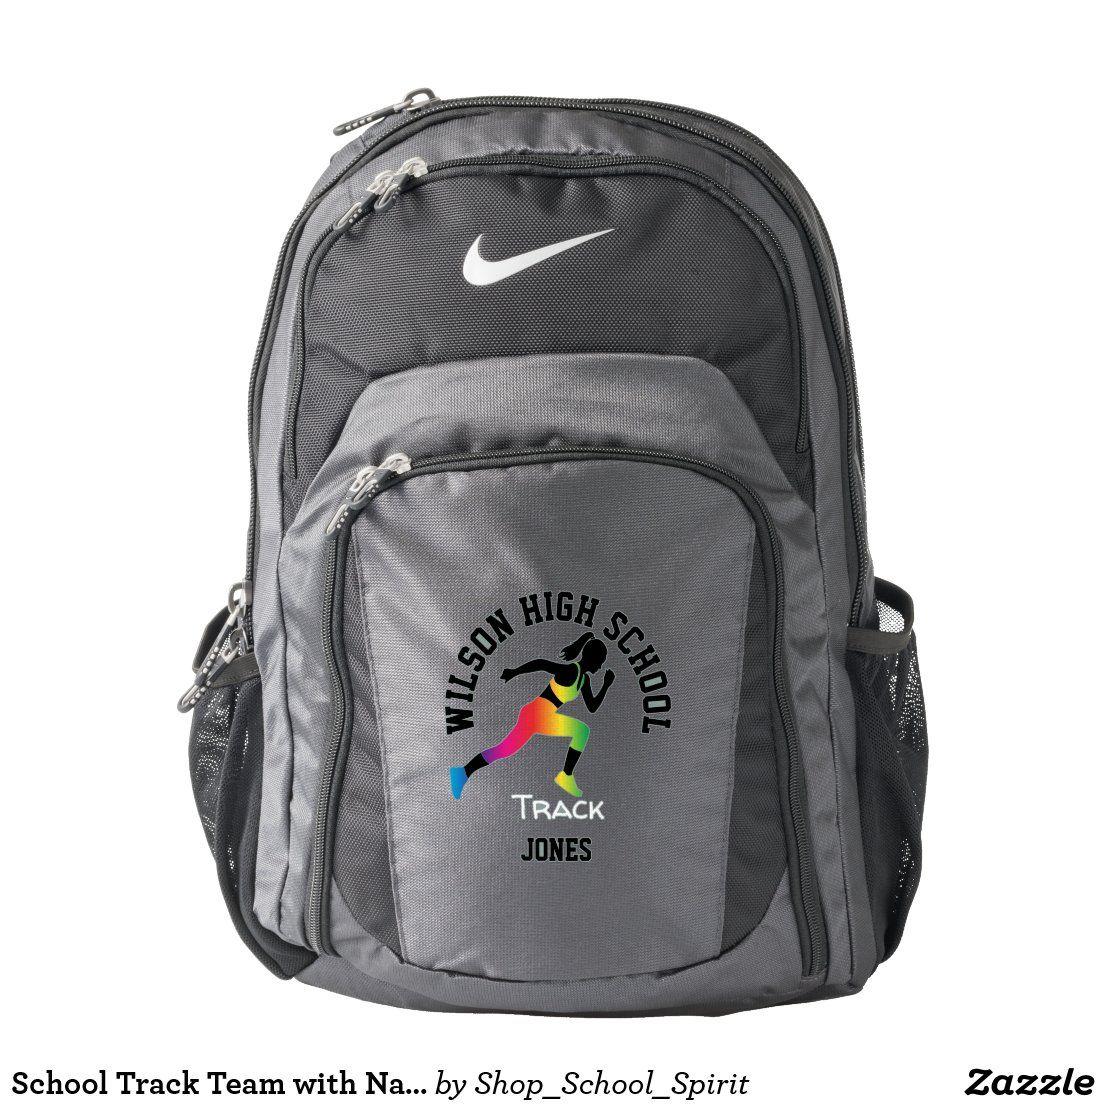 School Track Team with Names Nike School Spirit Backpack